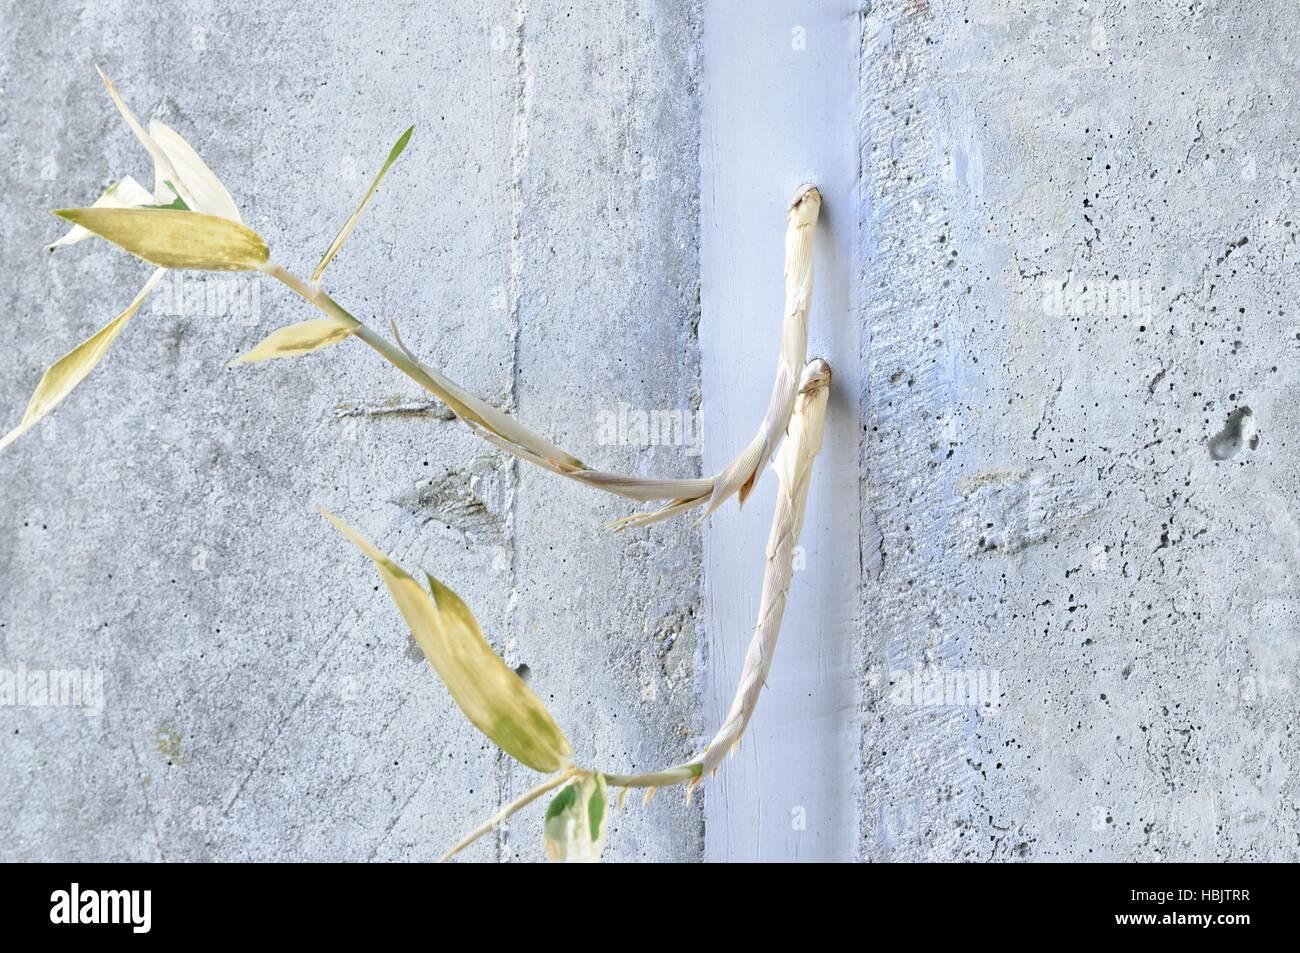 Bamboo Through The Silicone Stock Photo 127648411 Alamy